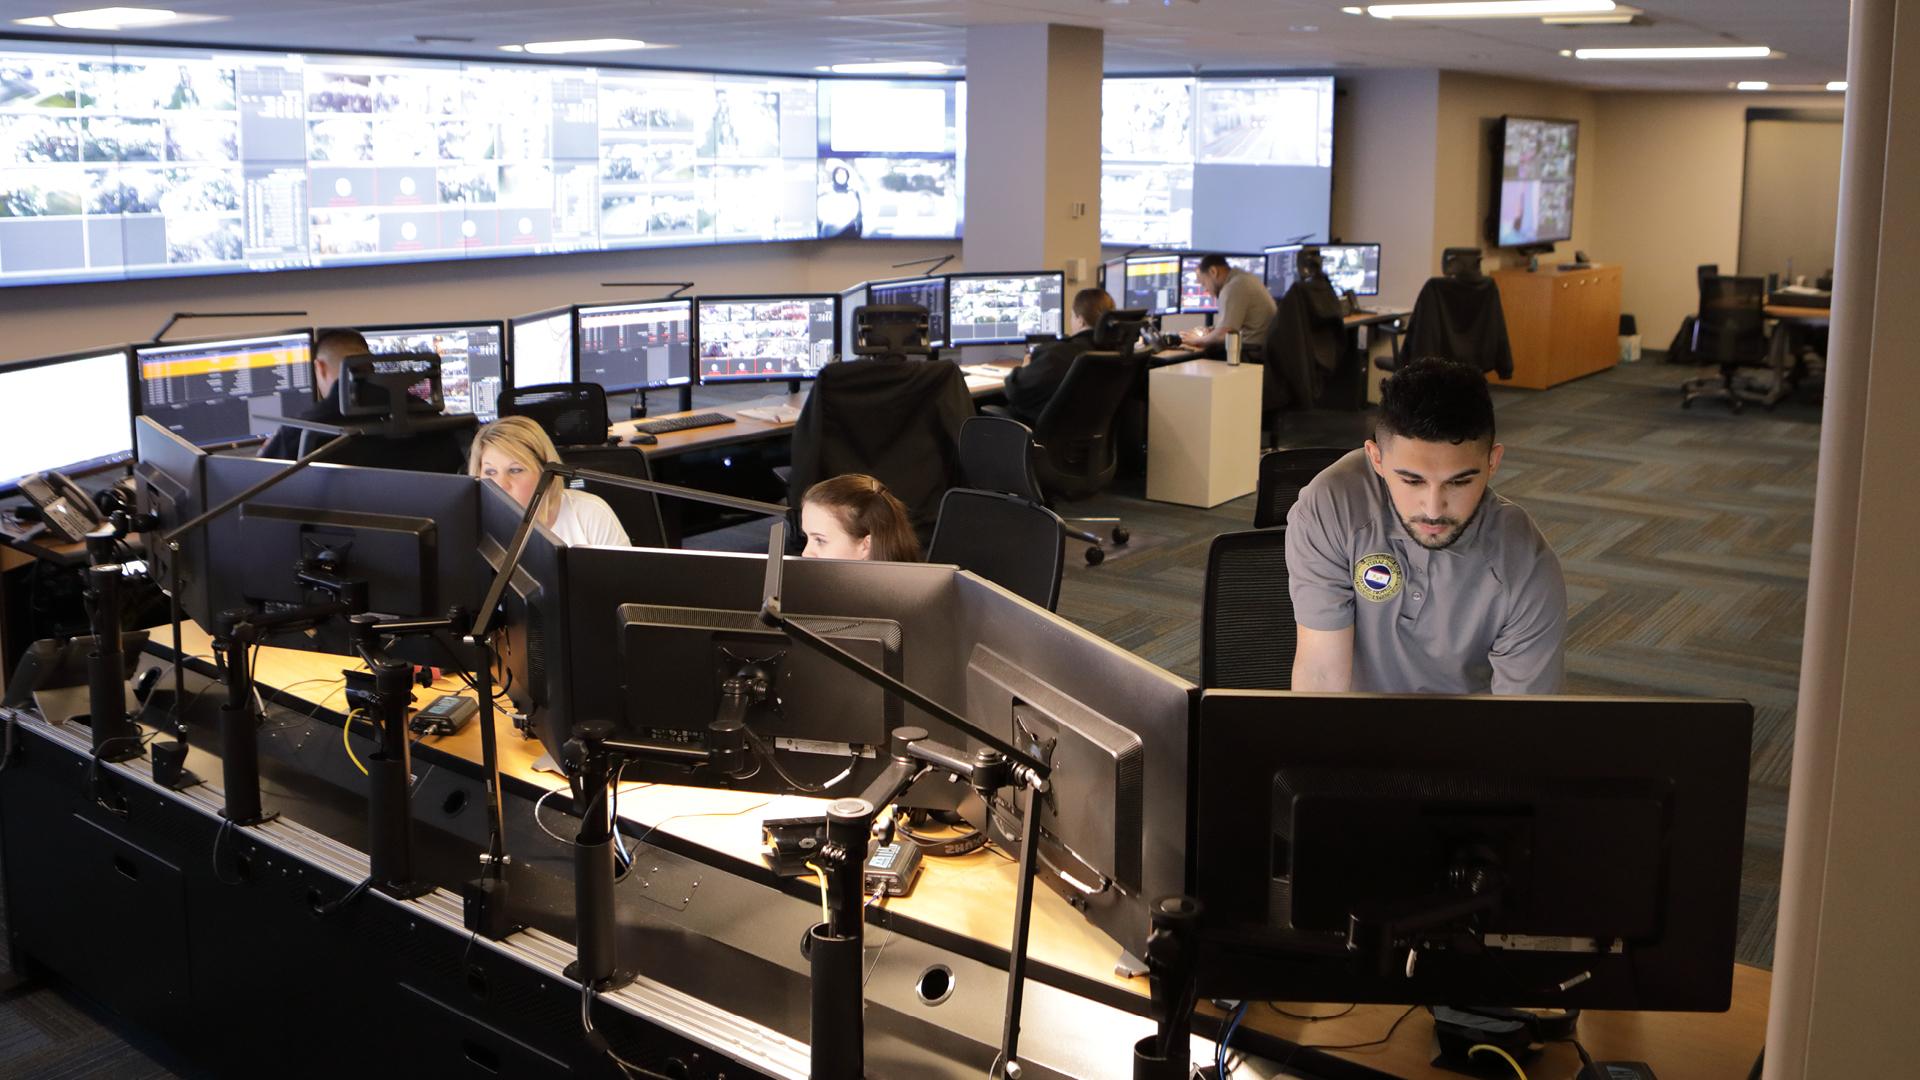 Command Center Software